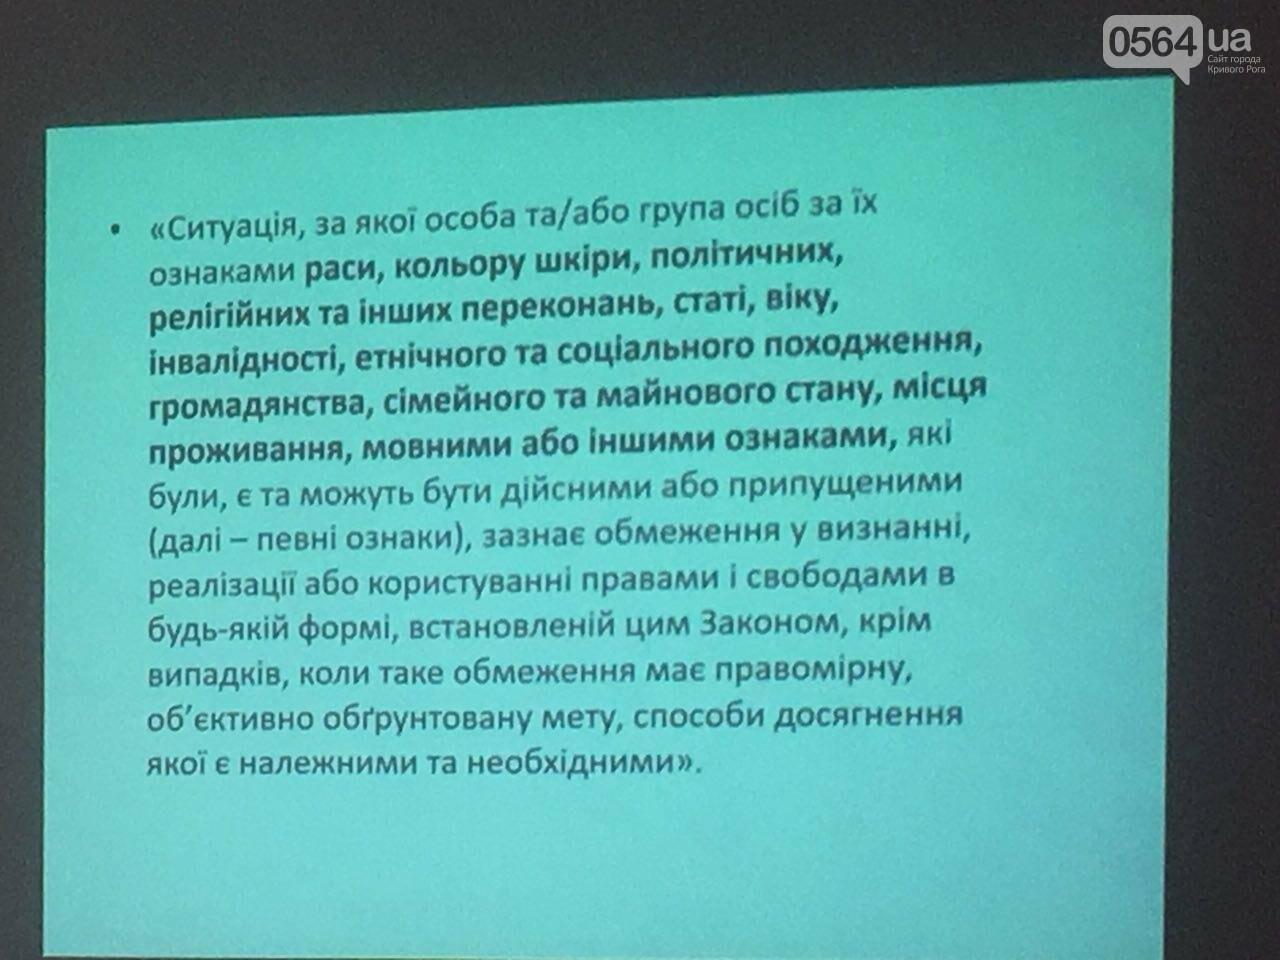 На тренинге о ВИЧ и медреформе криворожским журналистам рассказали о дискриминации и стереотипах, - ФОТО , фото-22